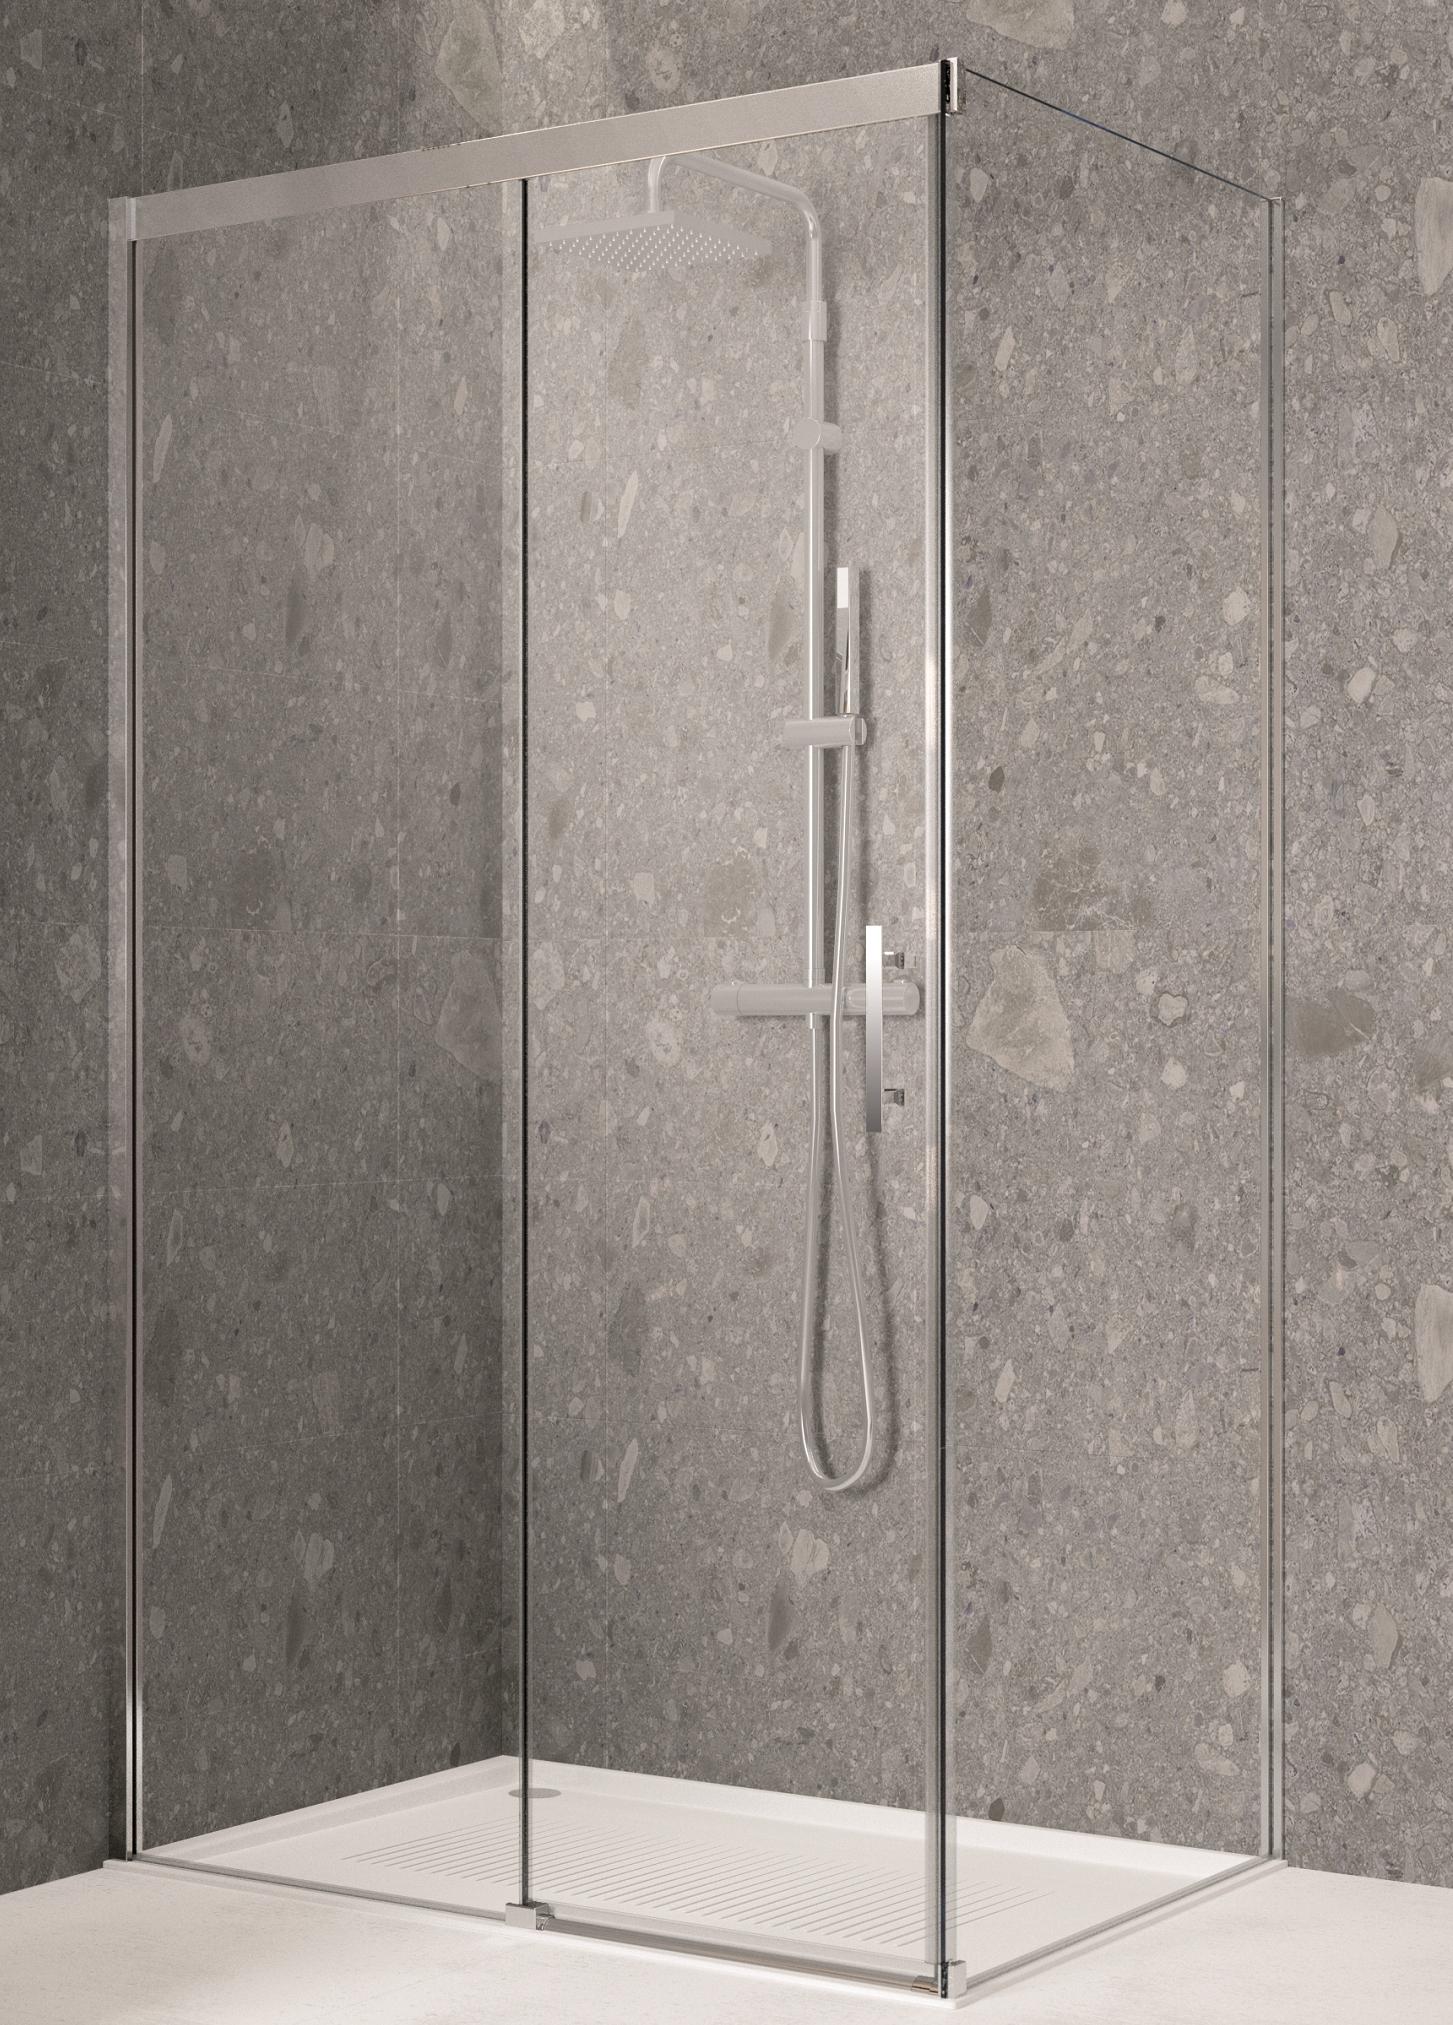 NOVELLINI sprcha KALI PH+FH ++170x100